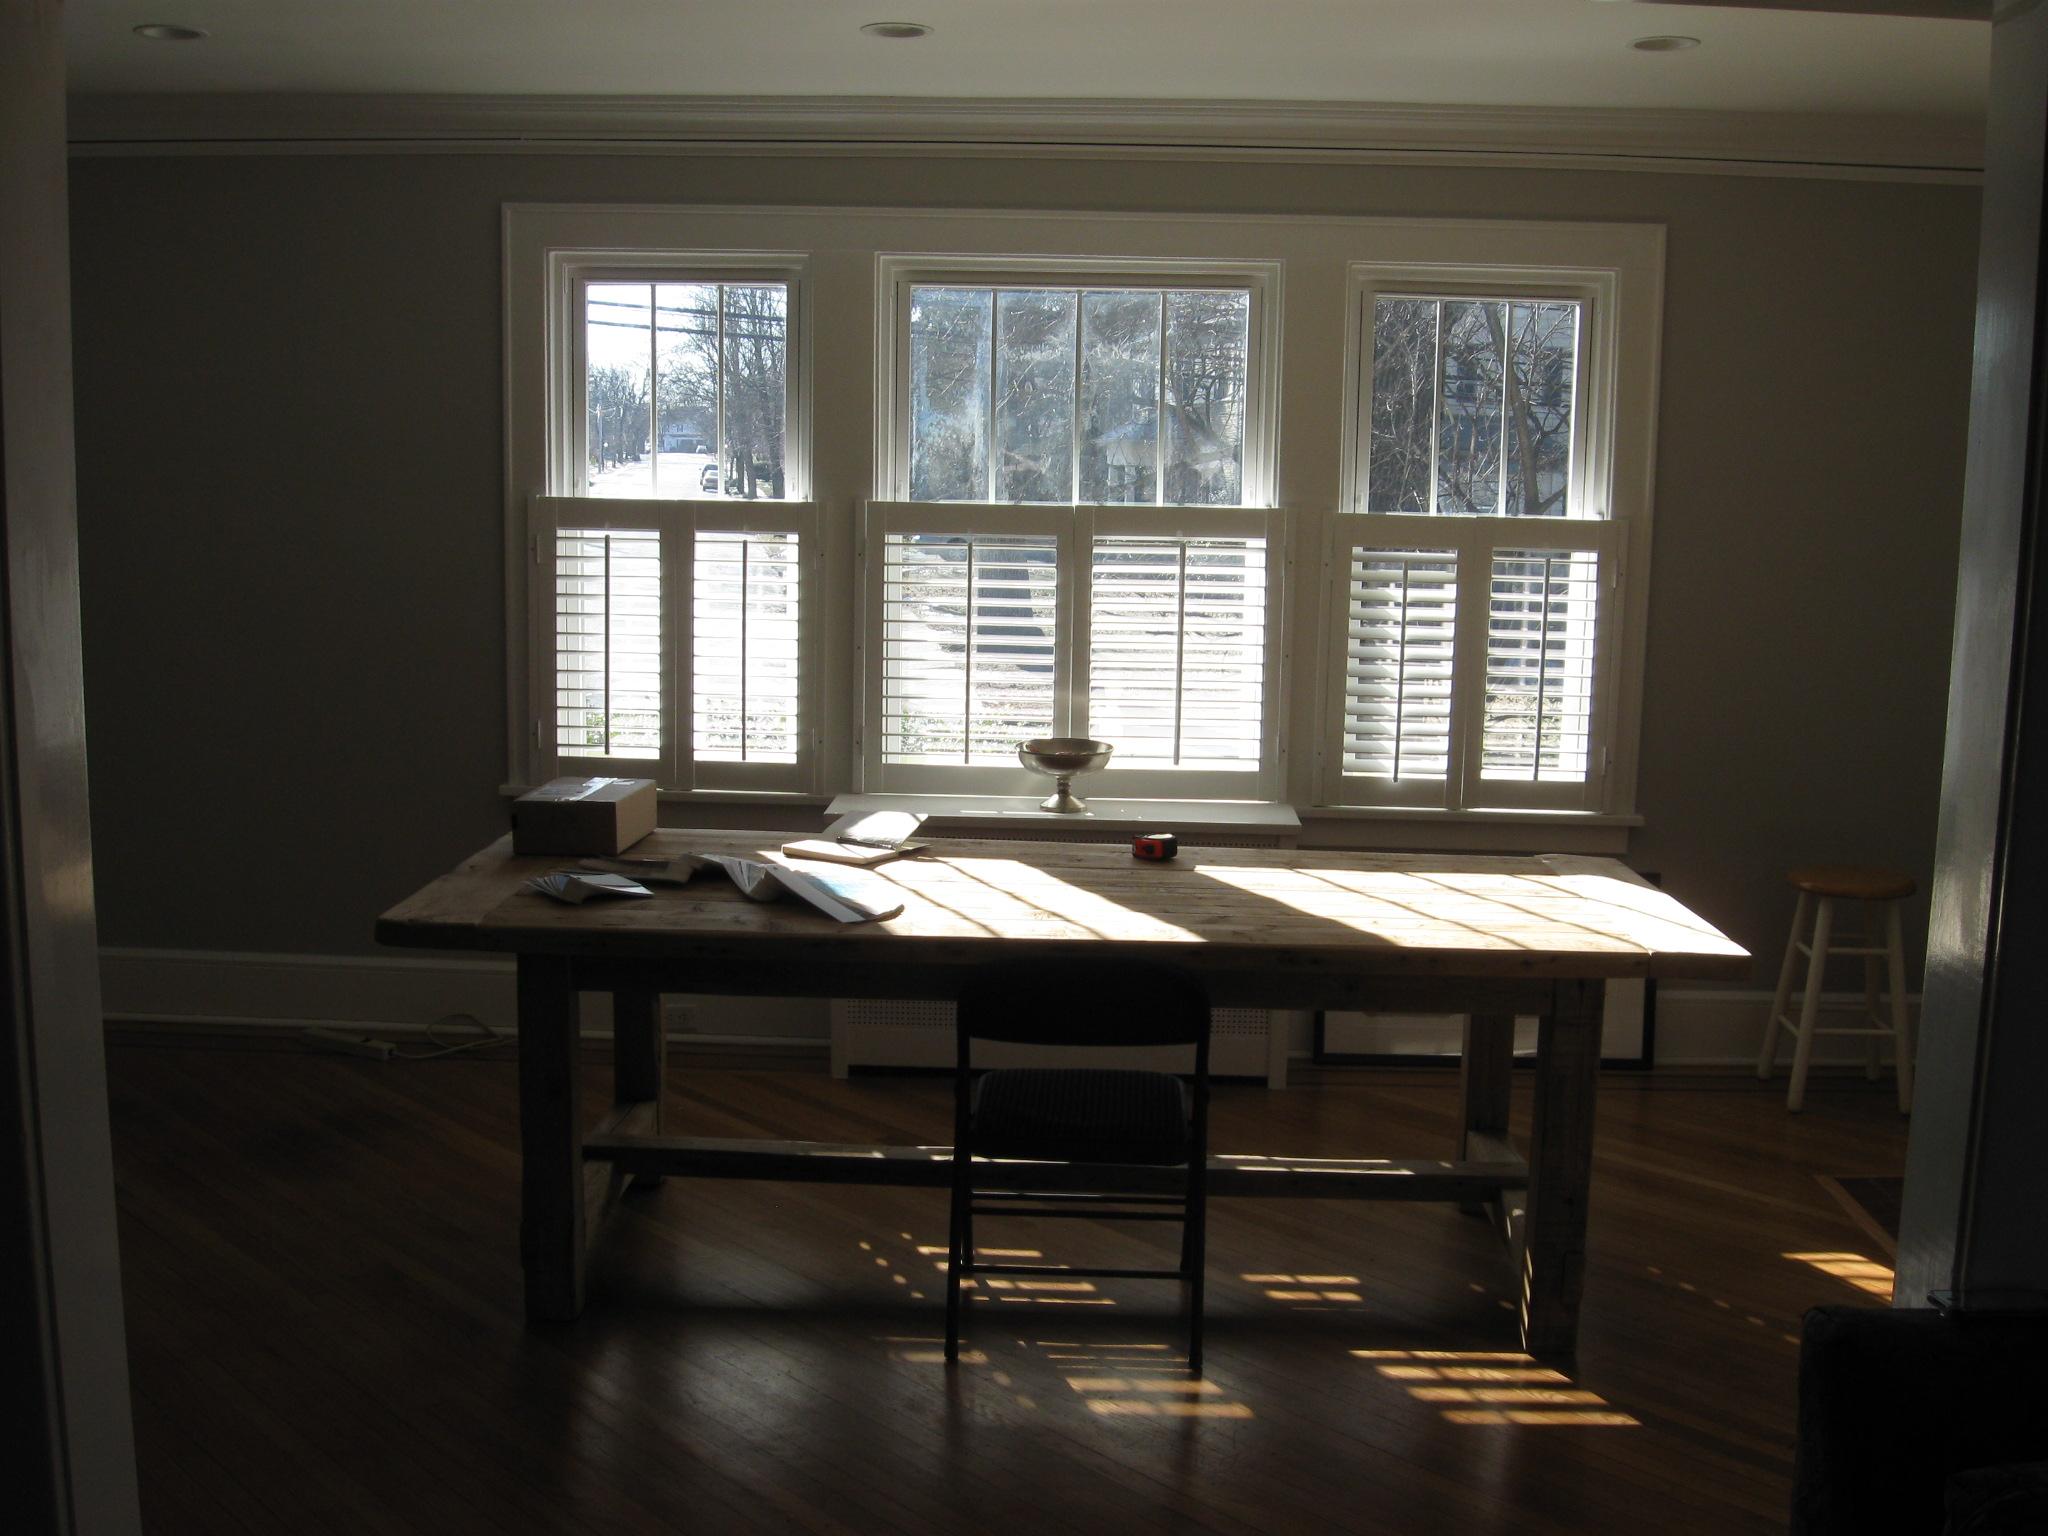 Disa's Dining Room Windows